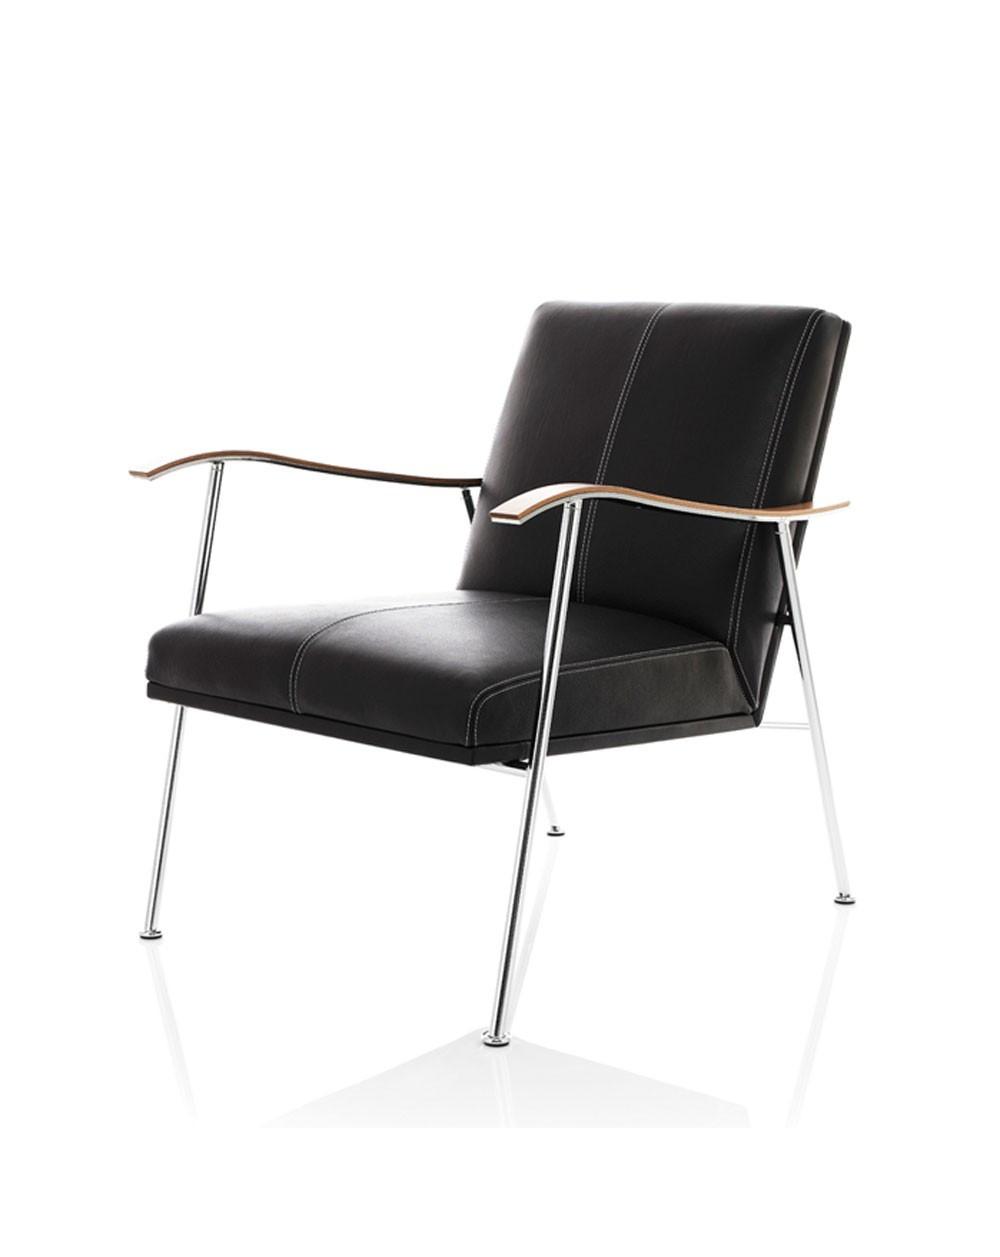 Sahara Easy chair Gunilla Allard Lammhults